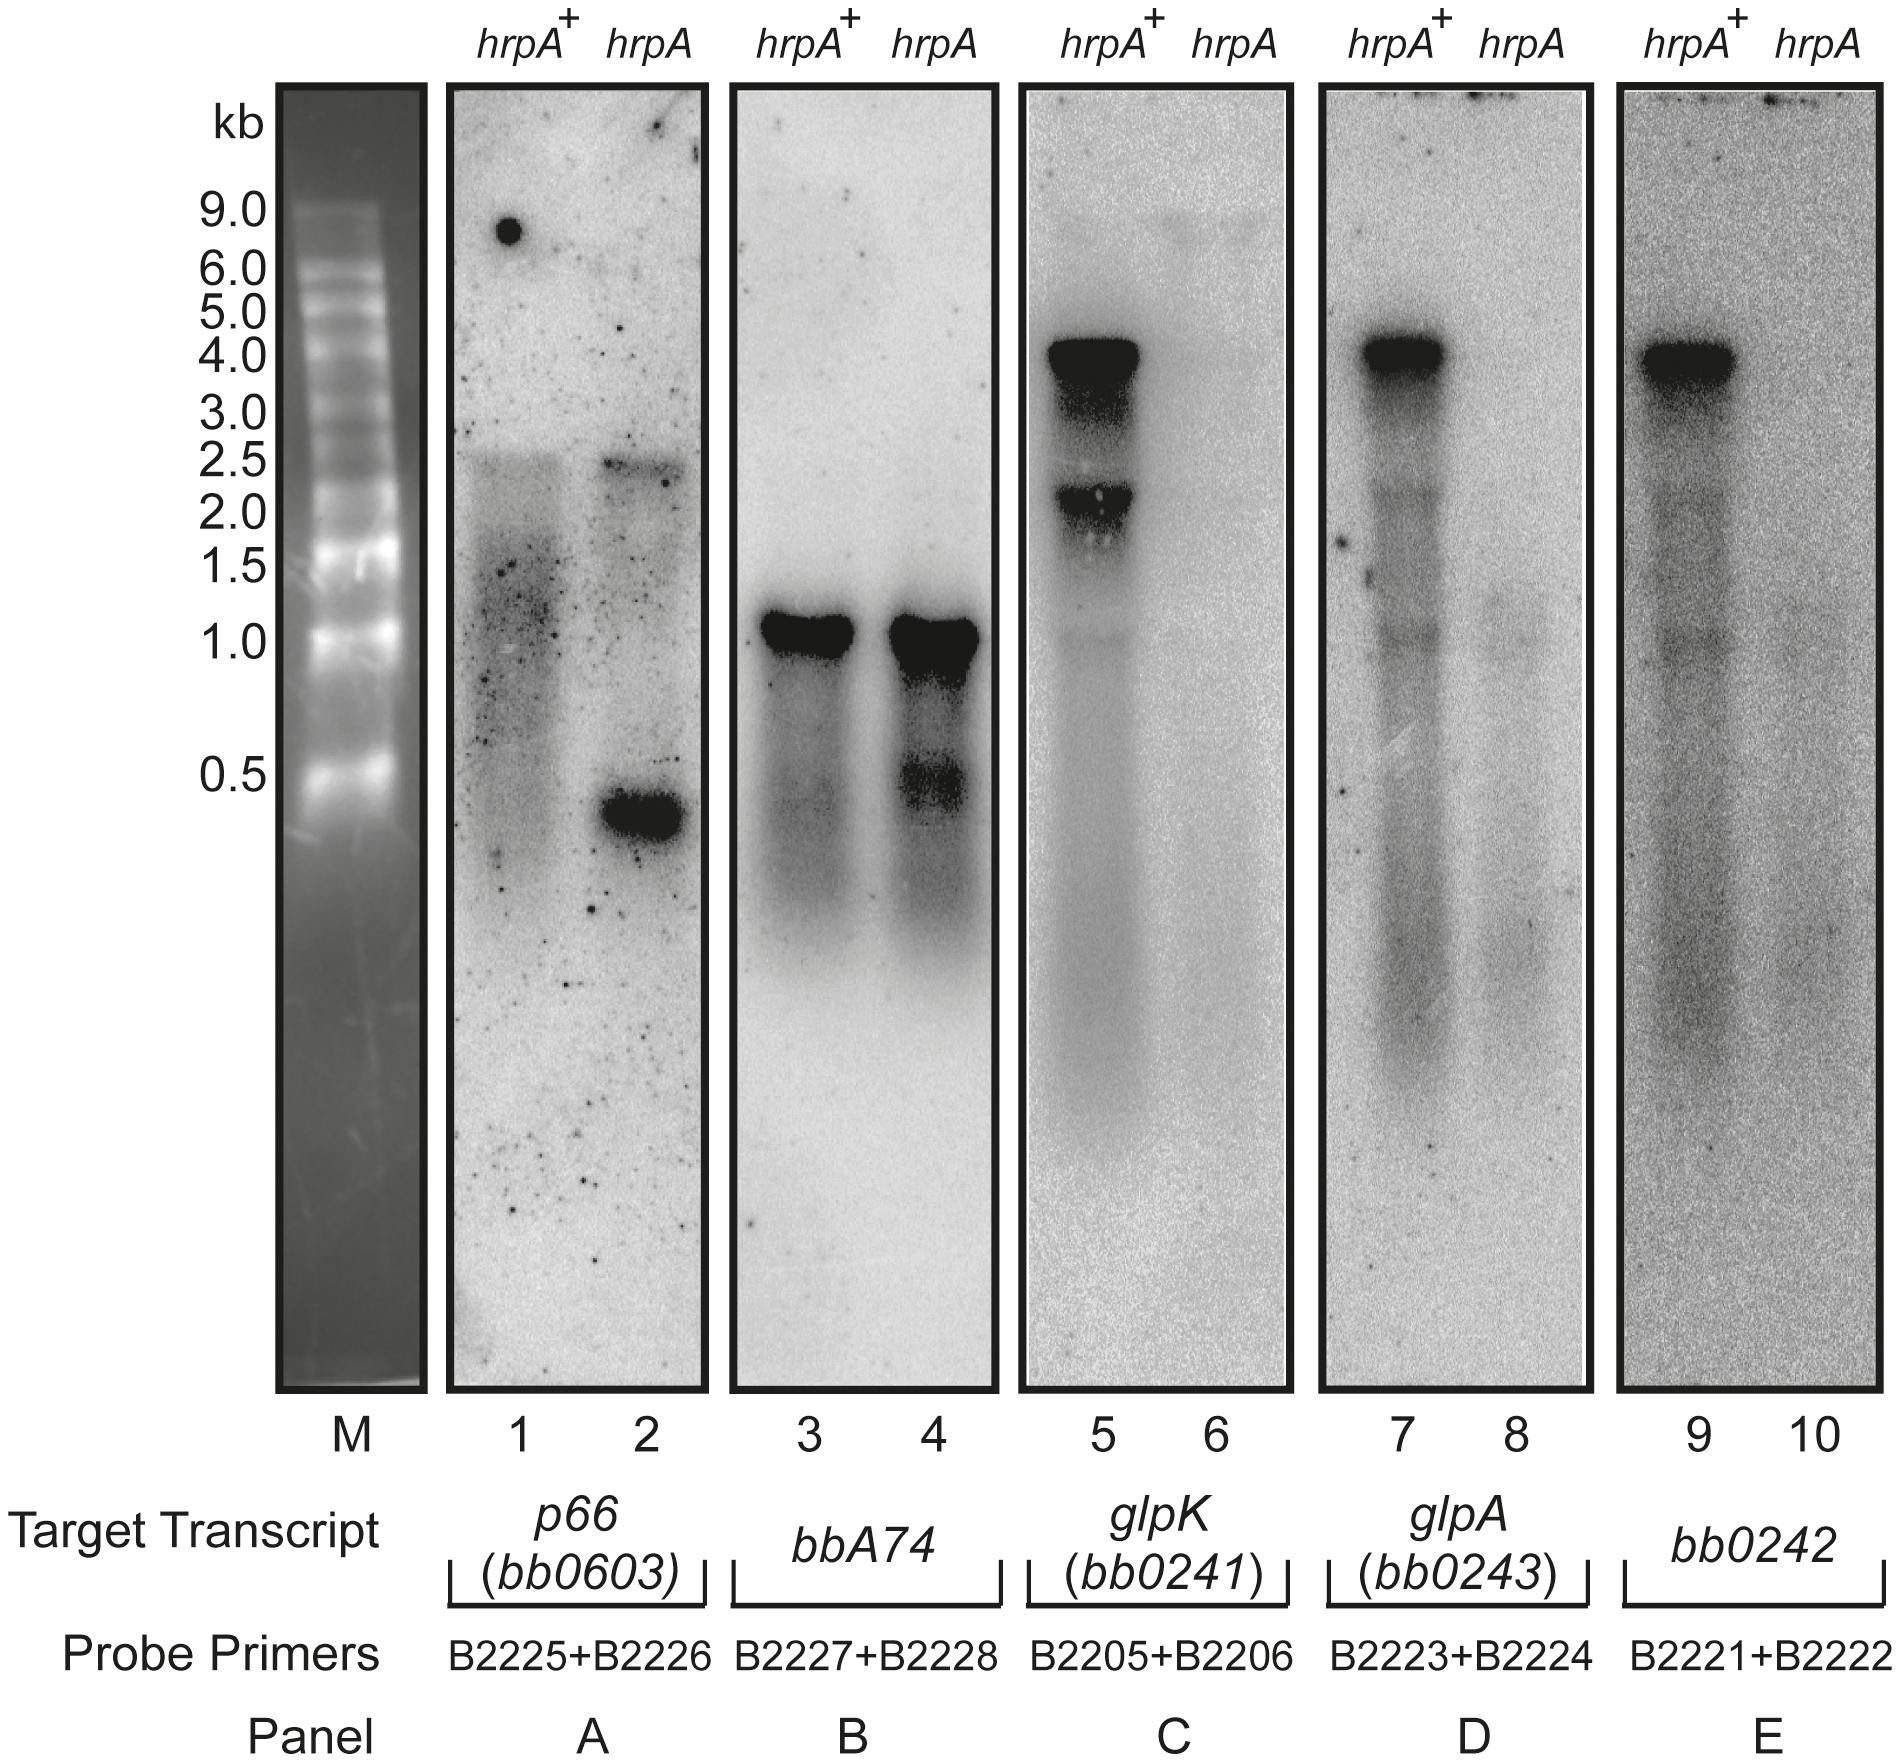 Northern blot analysis of p66, <i>oms28, glpK bb0242 and glpA</i>.